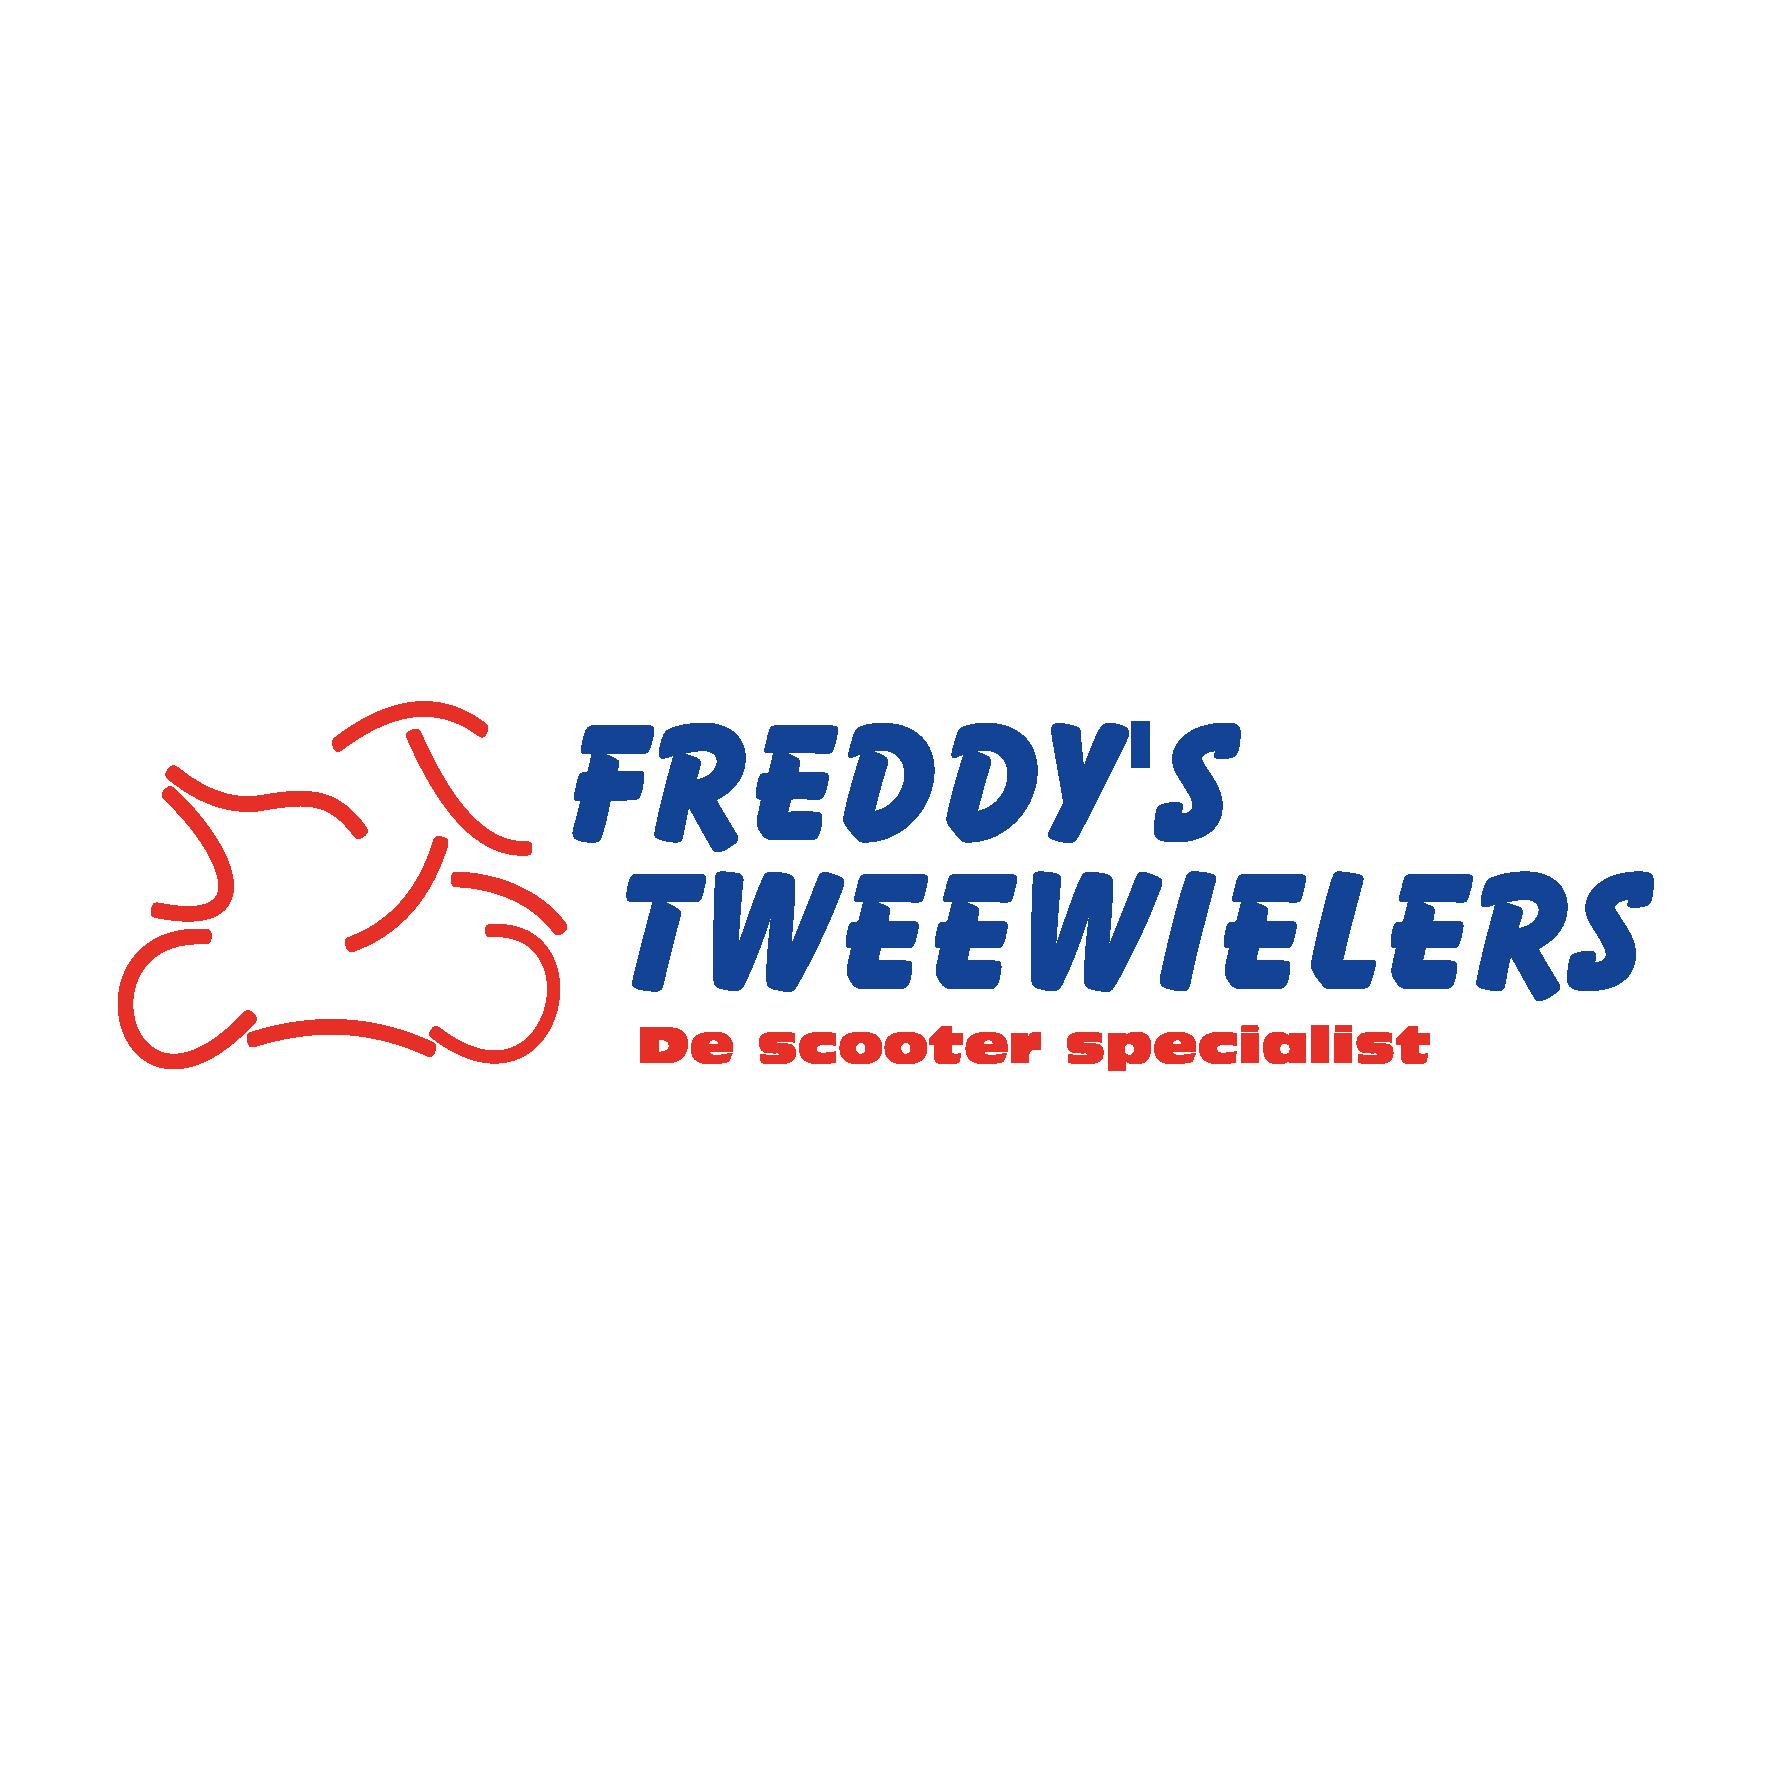 Freddy's Tweewielers